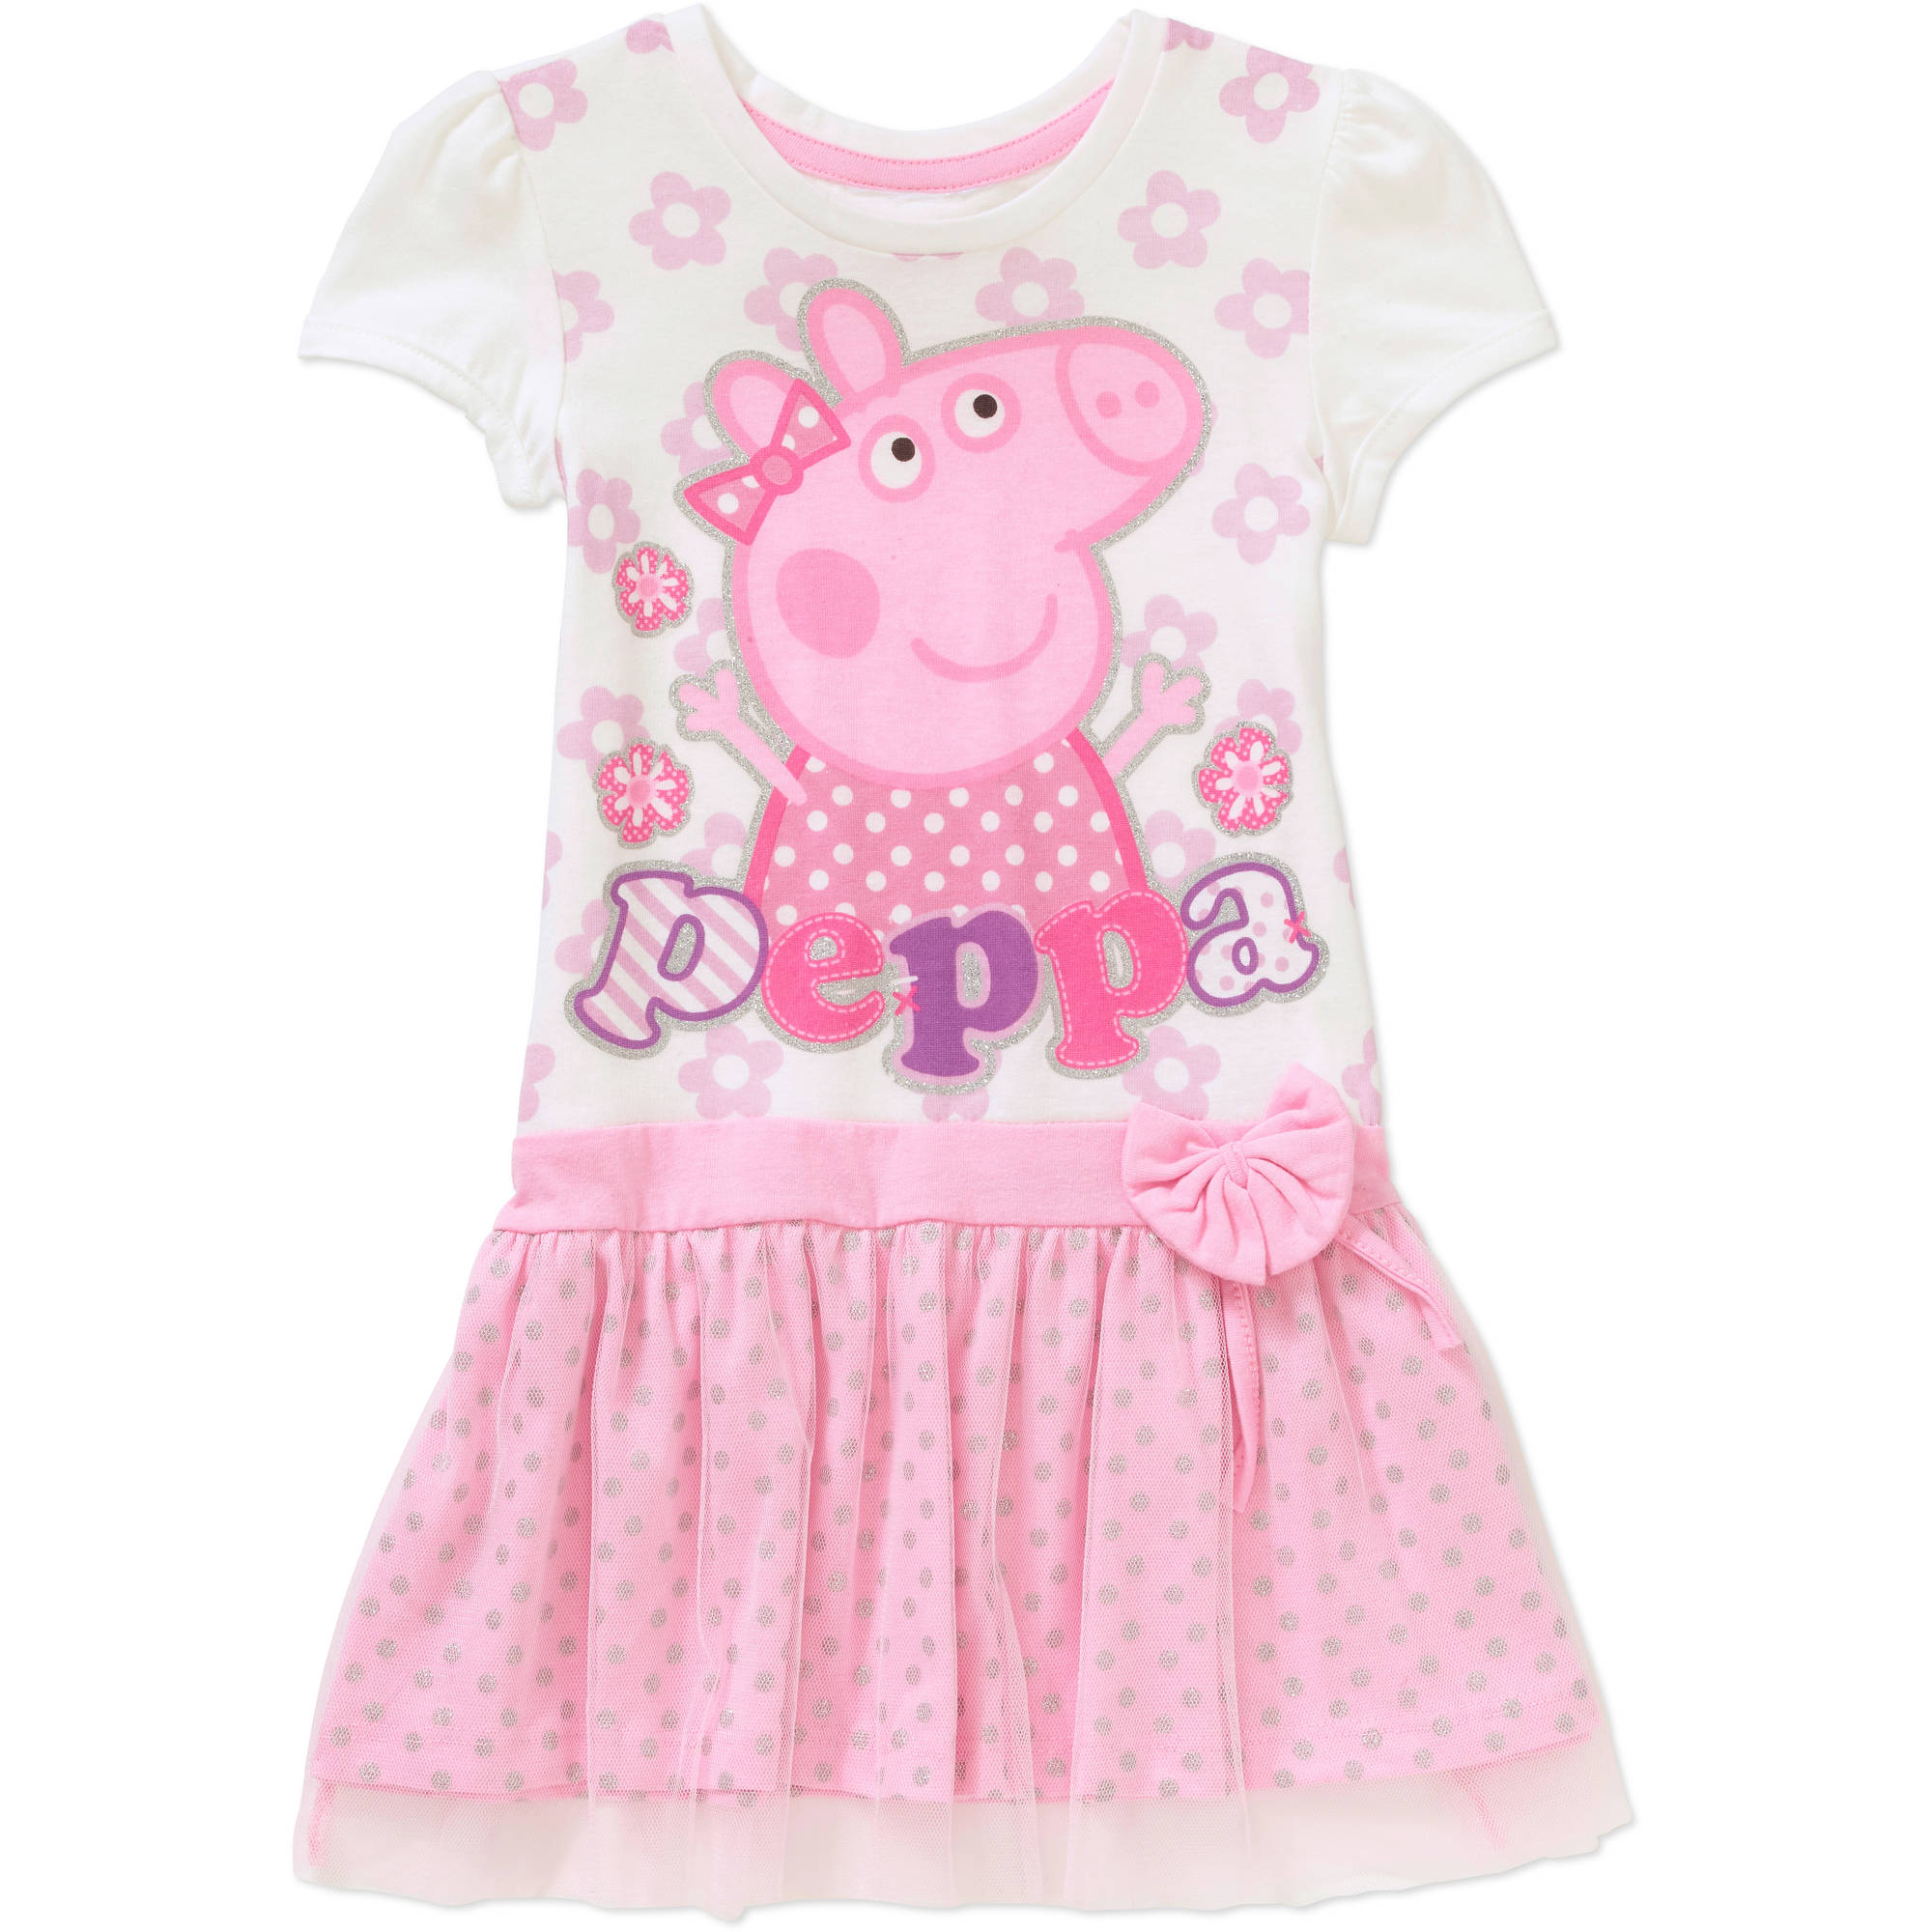 Peppa Pig Toddler Girl Graphic Short Sleeve Tee Shirt Dress